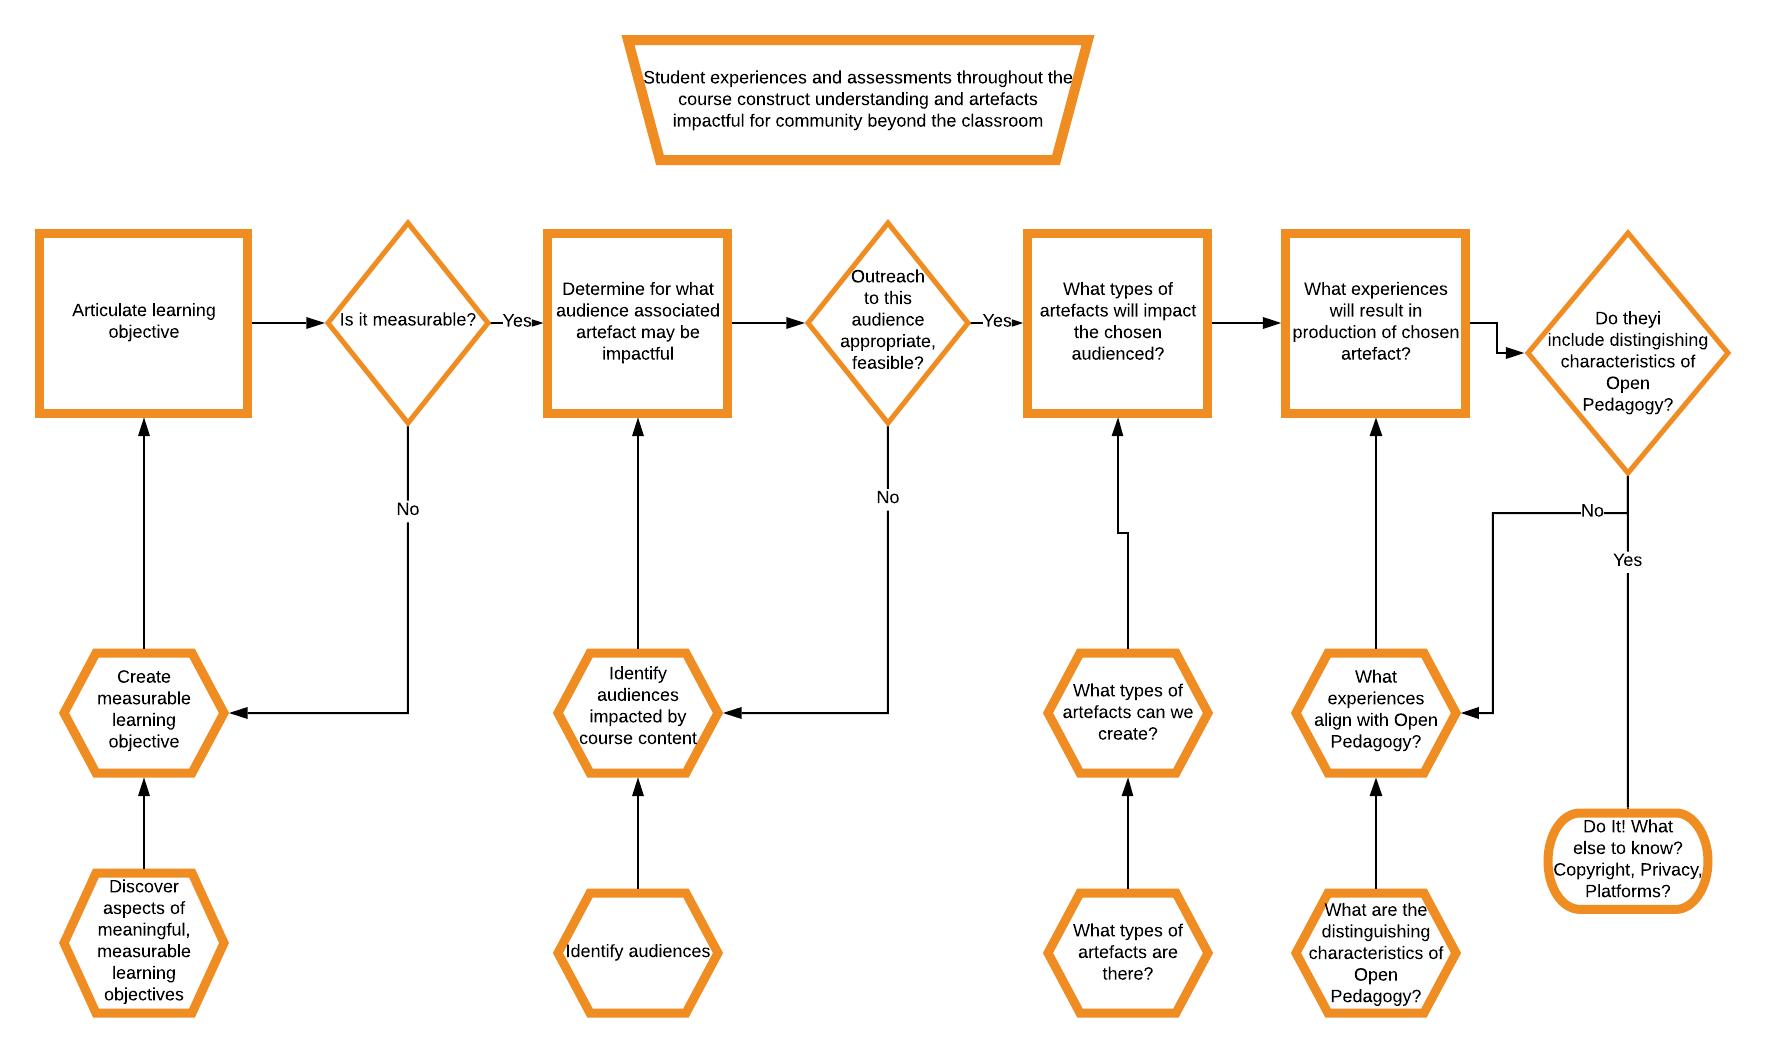 Flow chart describing steps in design of open pedagogy projects